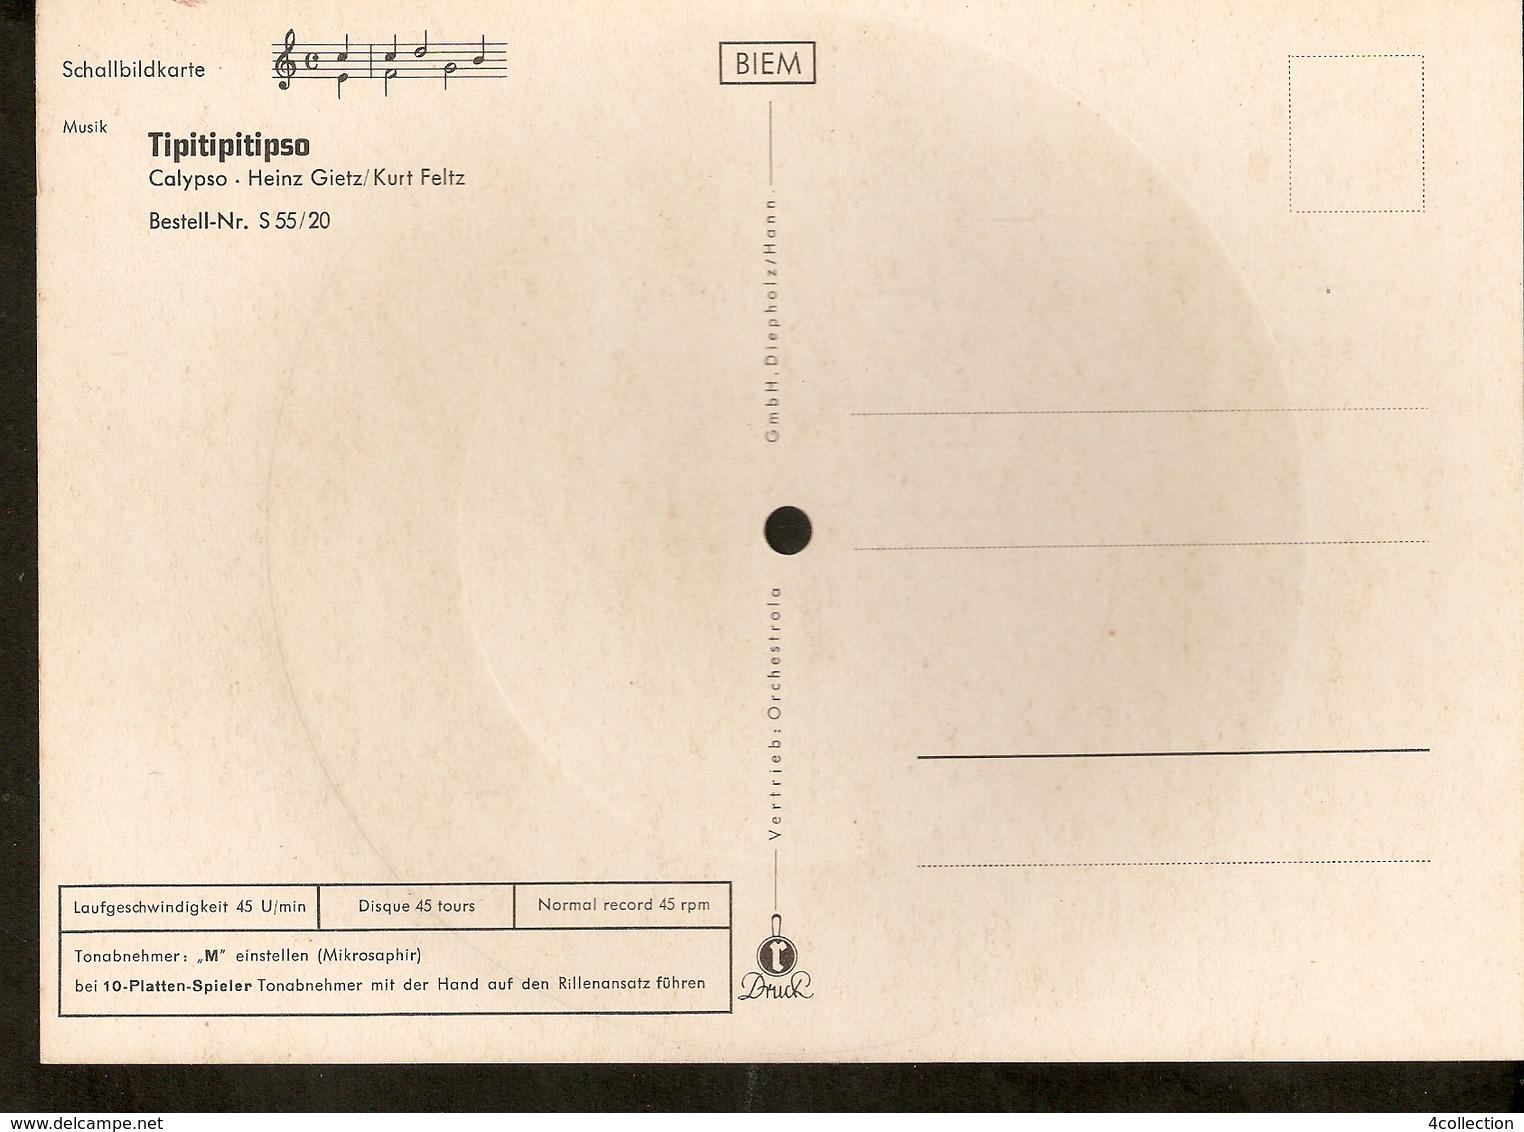 Old Musical 45rpm Record Postcard Schallbildkarte Tipitipitipso Calypso Heinz Gietz Kurt Feltz Lily Valle - Unclassified